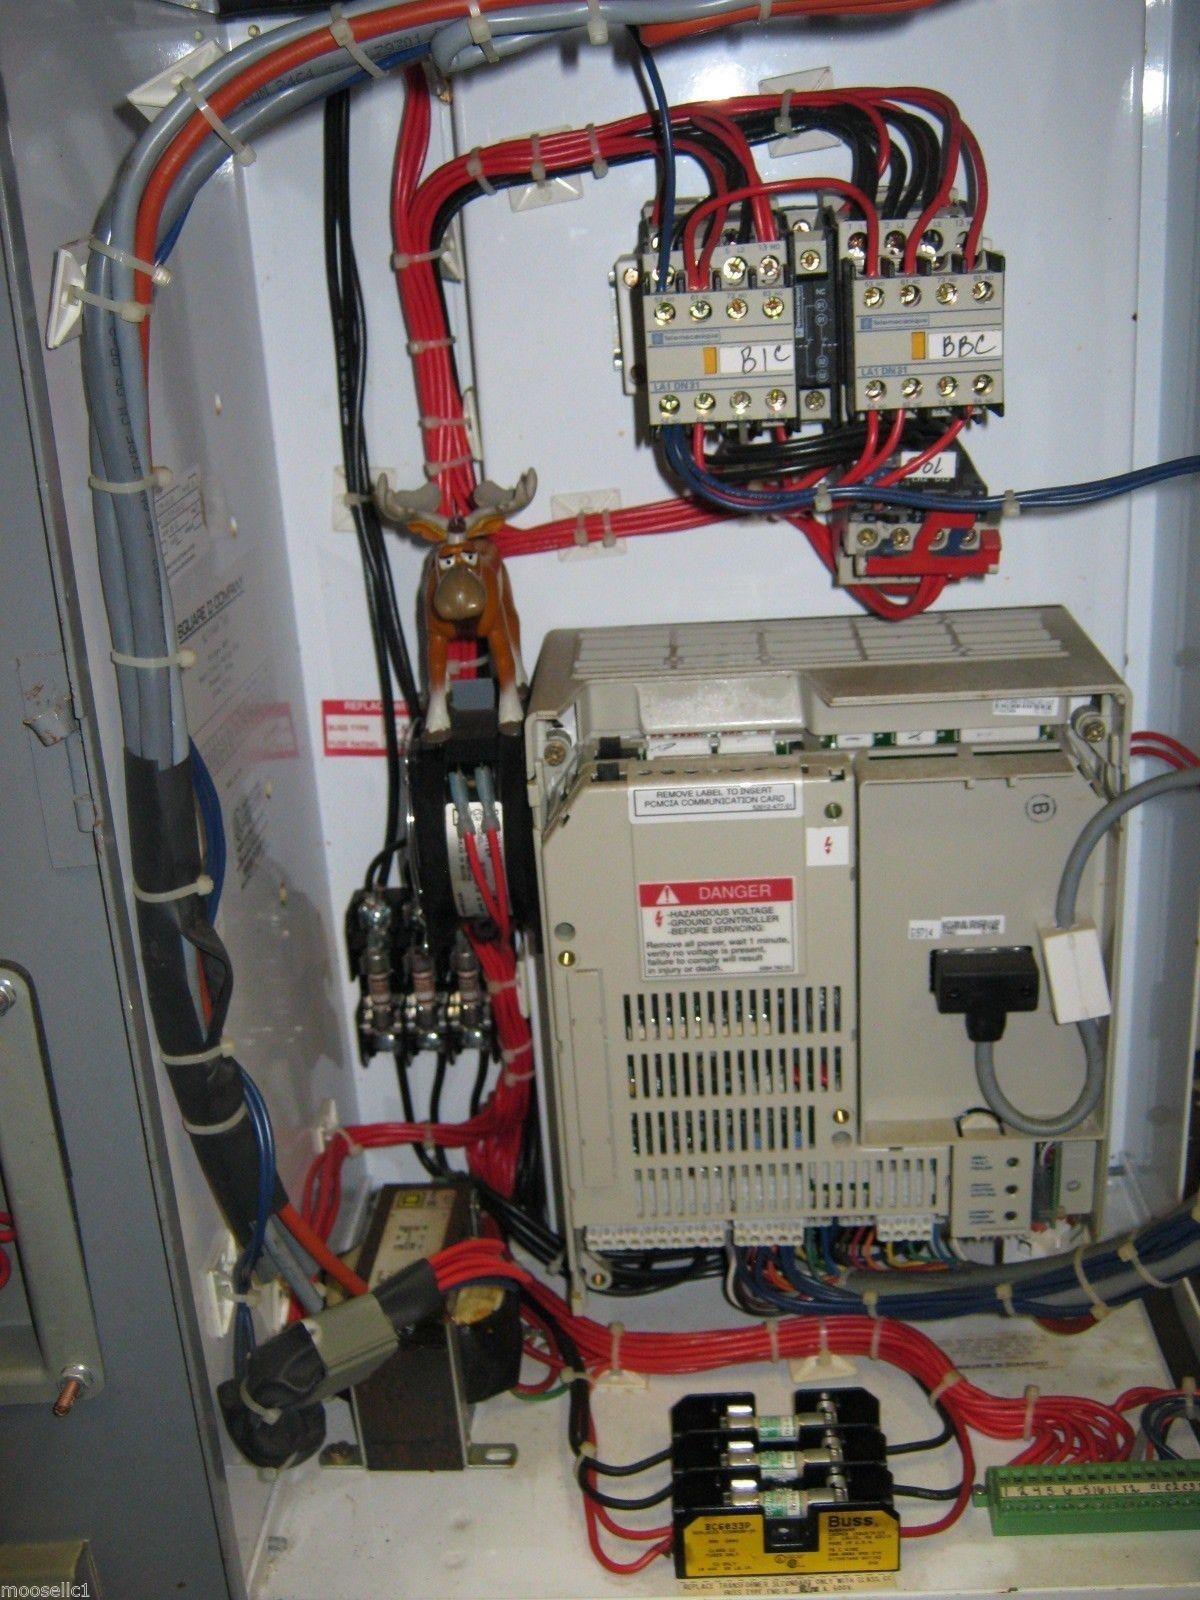 square d motor control diagram 2000 volkswagen jetta stereo wiring center bucket mod 6 altivar 66 atv66u54n4 5hpsquare